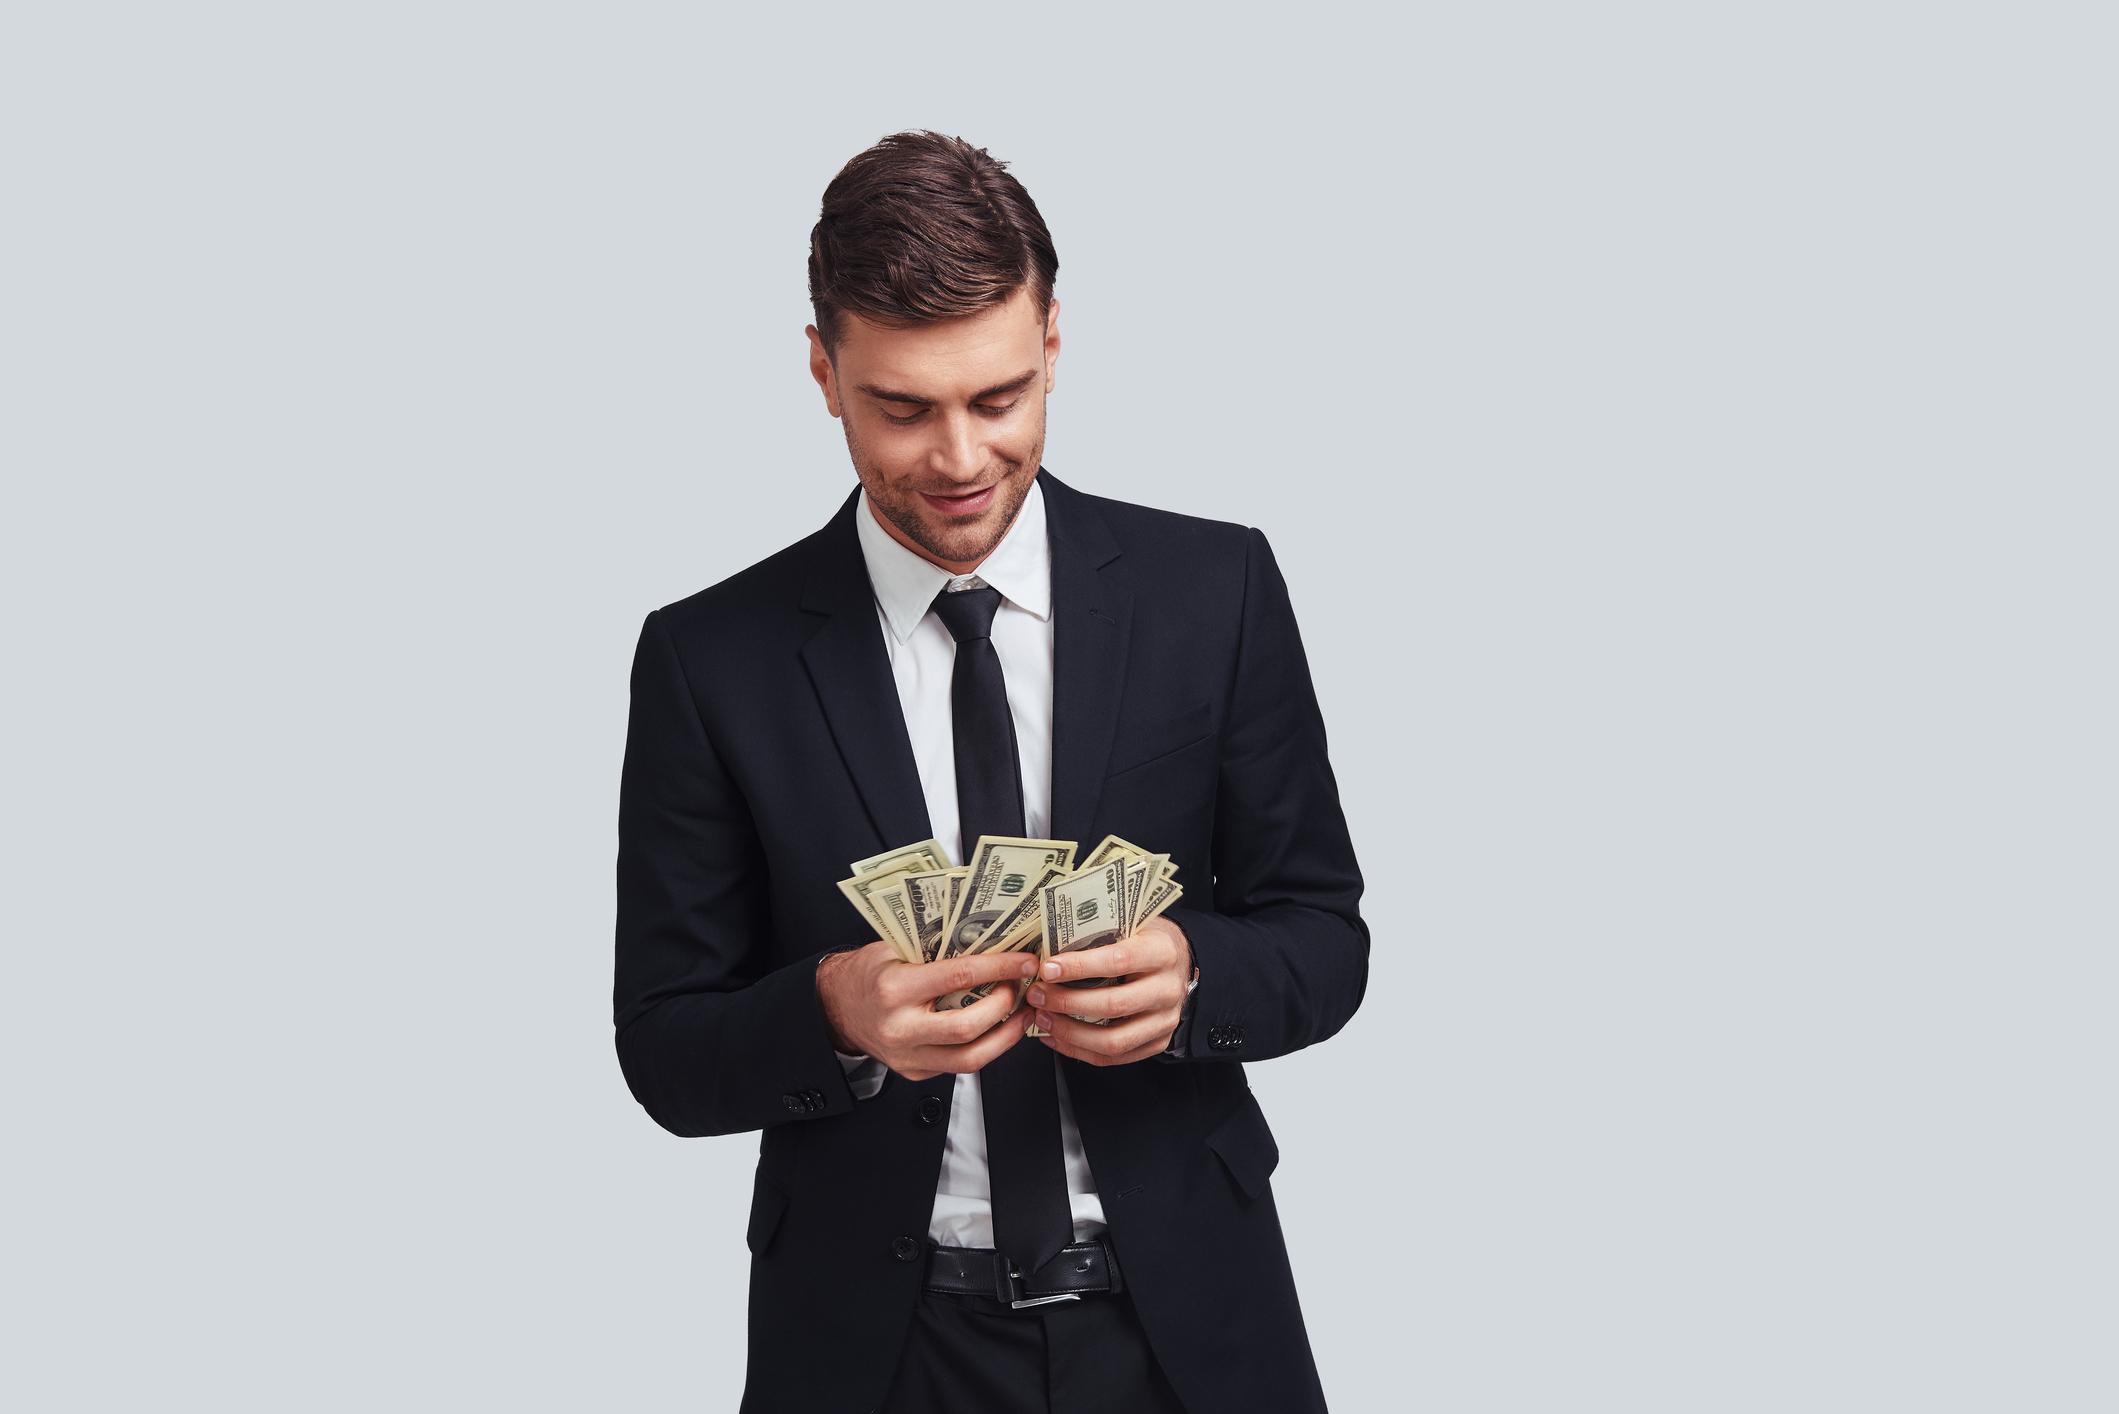 4 Tricks Billionaires Use to Make Their Money Work for Them